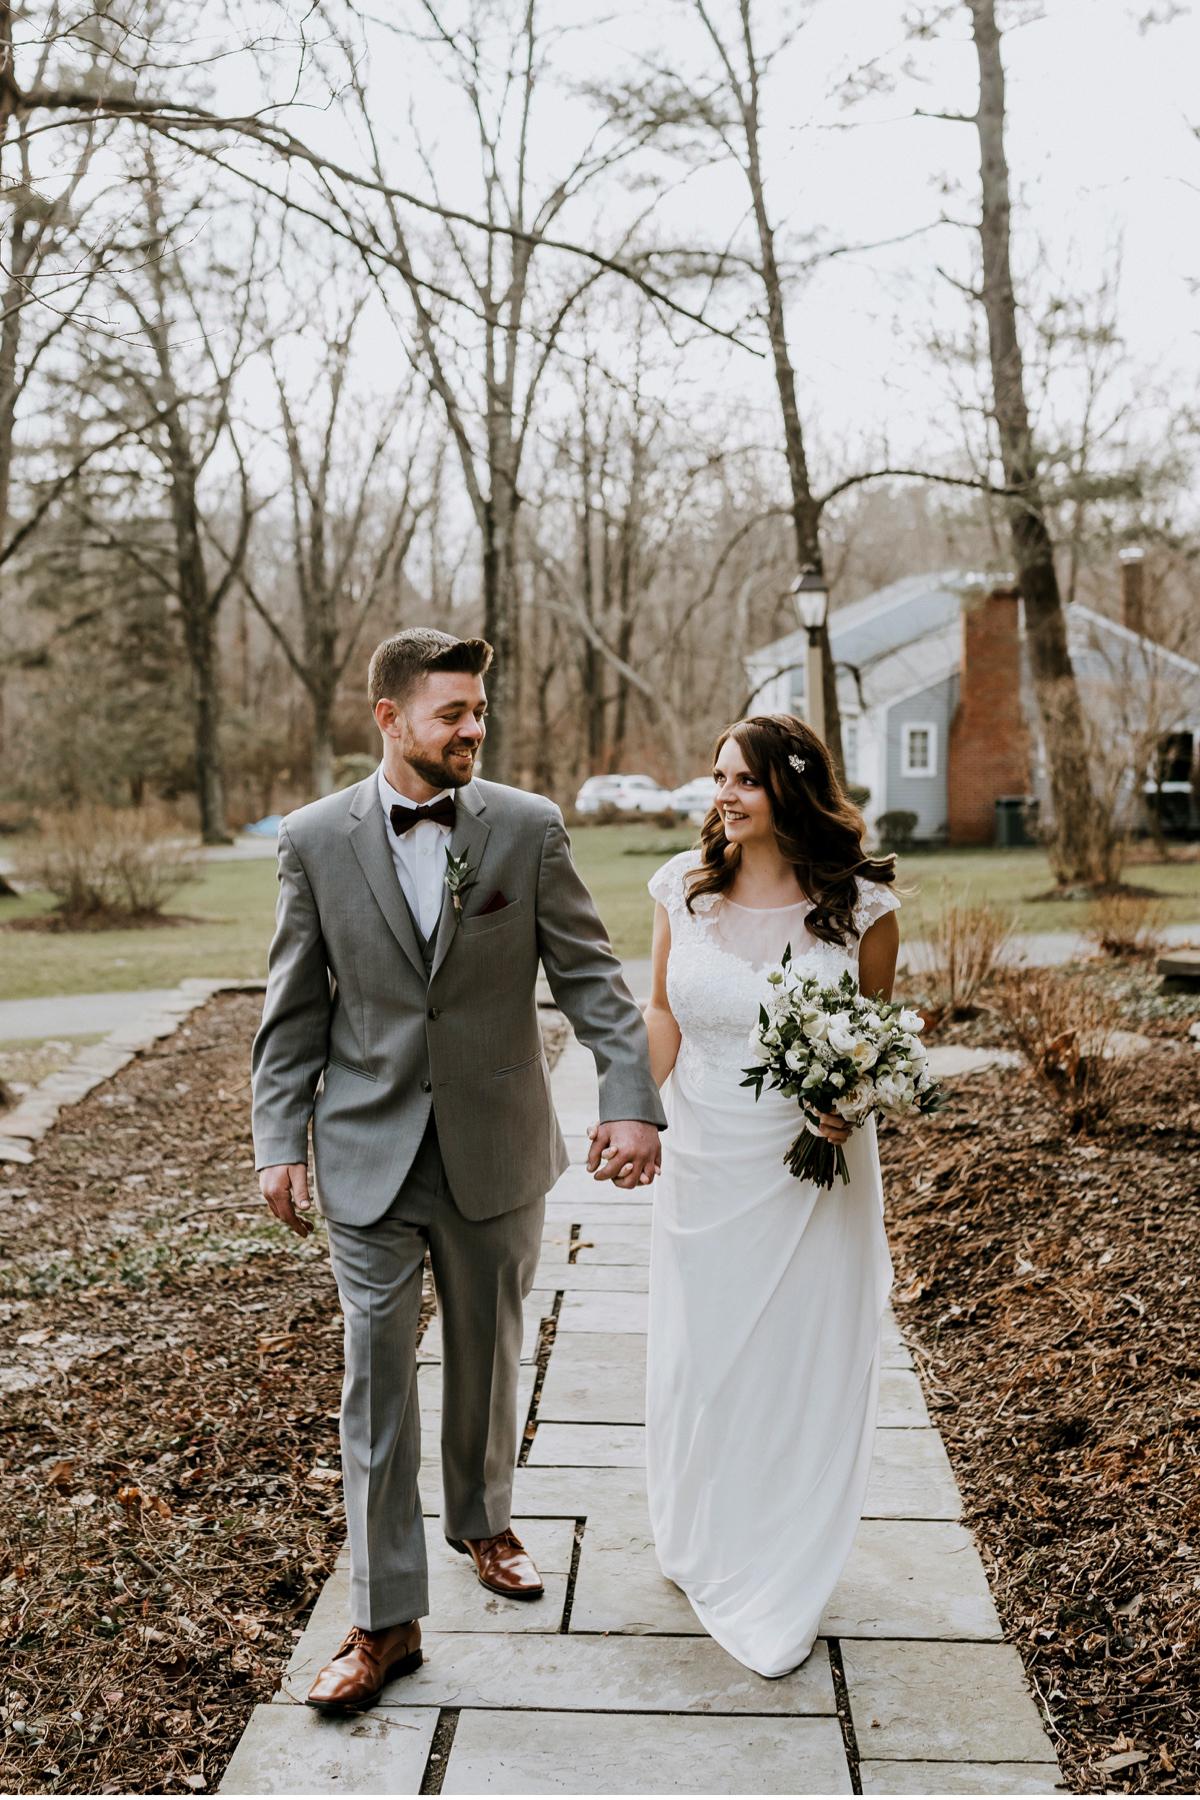 22 Winter Elopement Adventurous Elopement Photographer New Jersey Wedding Photographer Intimate Wedding